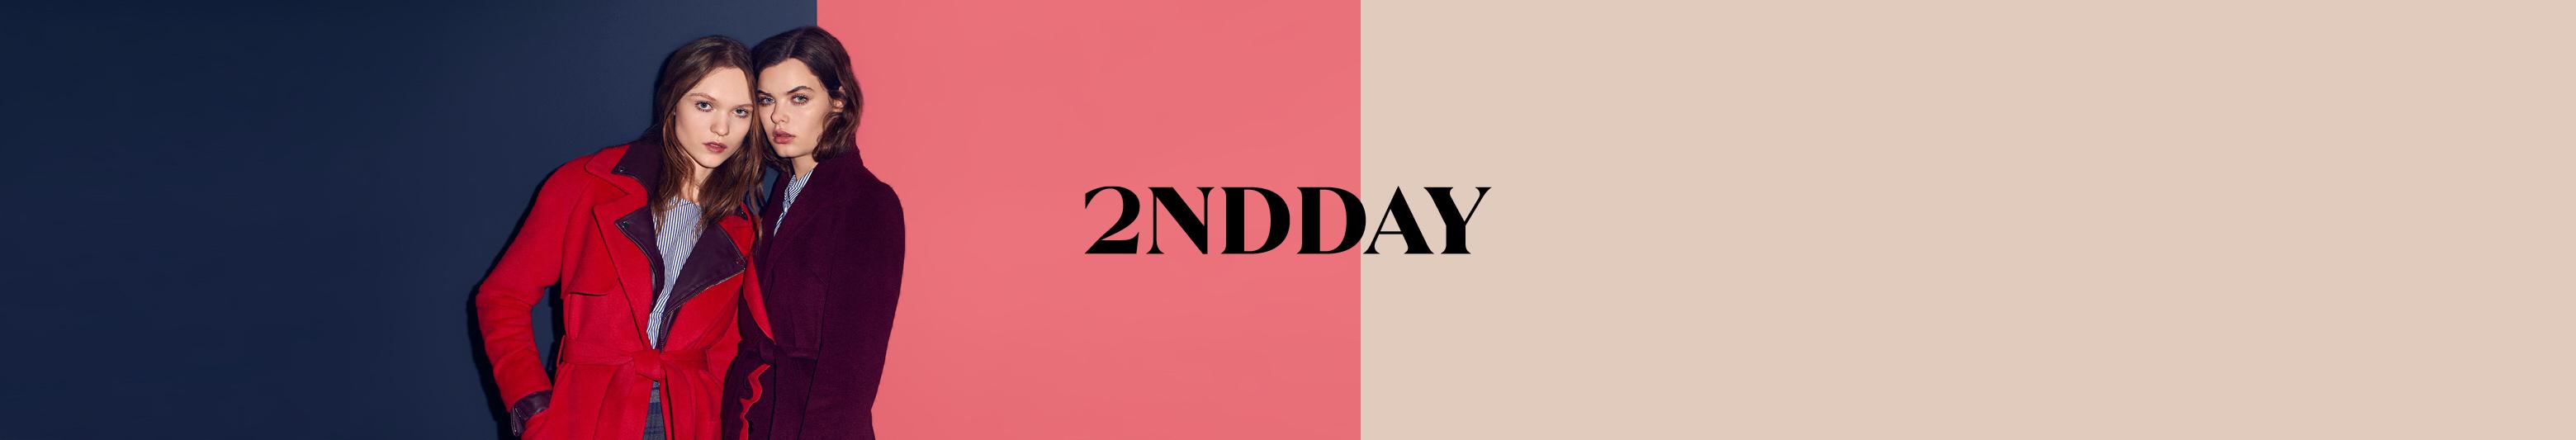 Boozt_Banner_2ndDAY